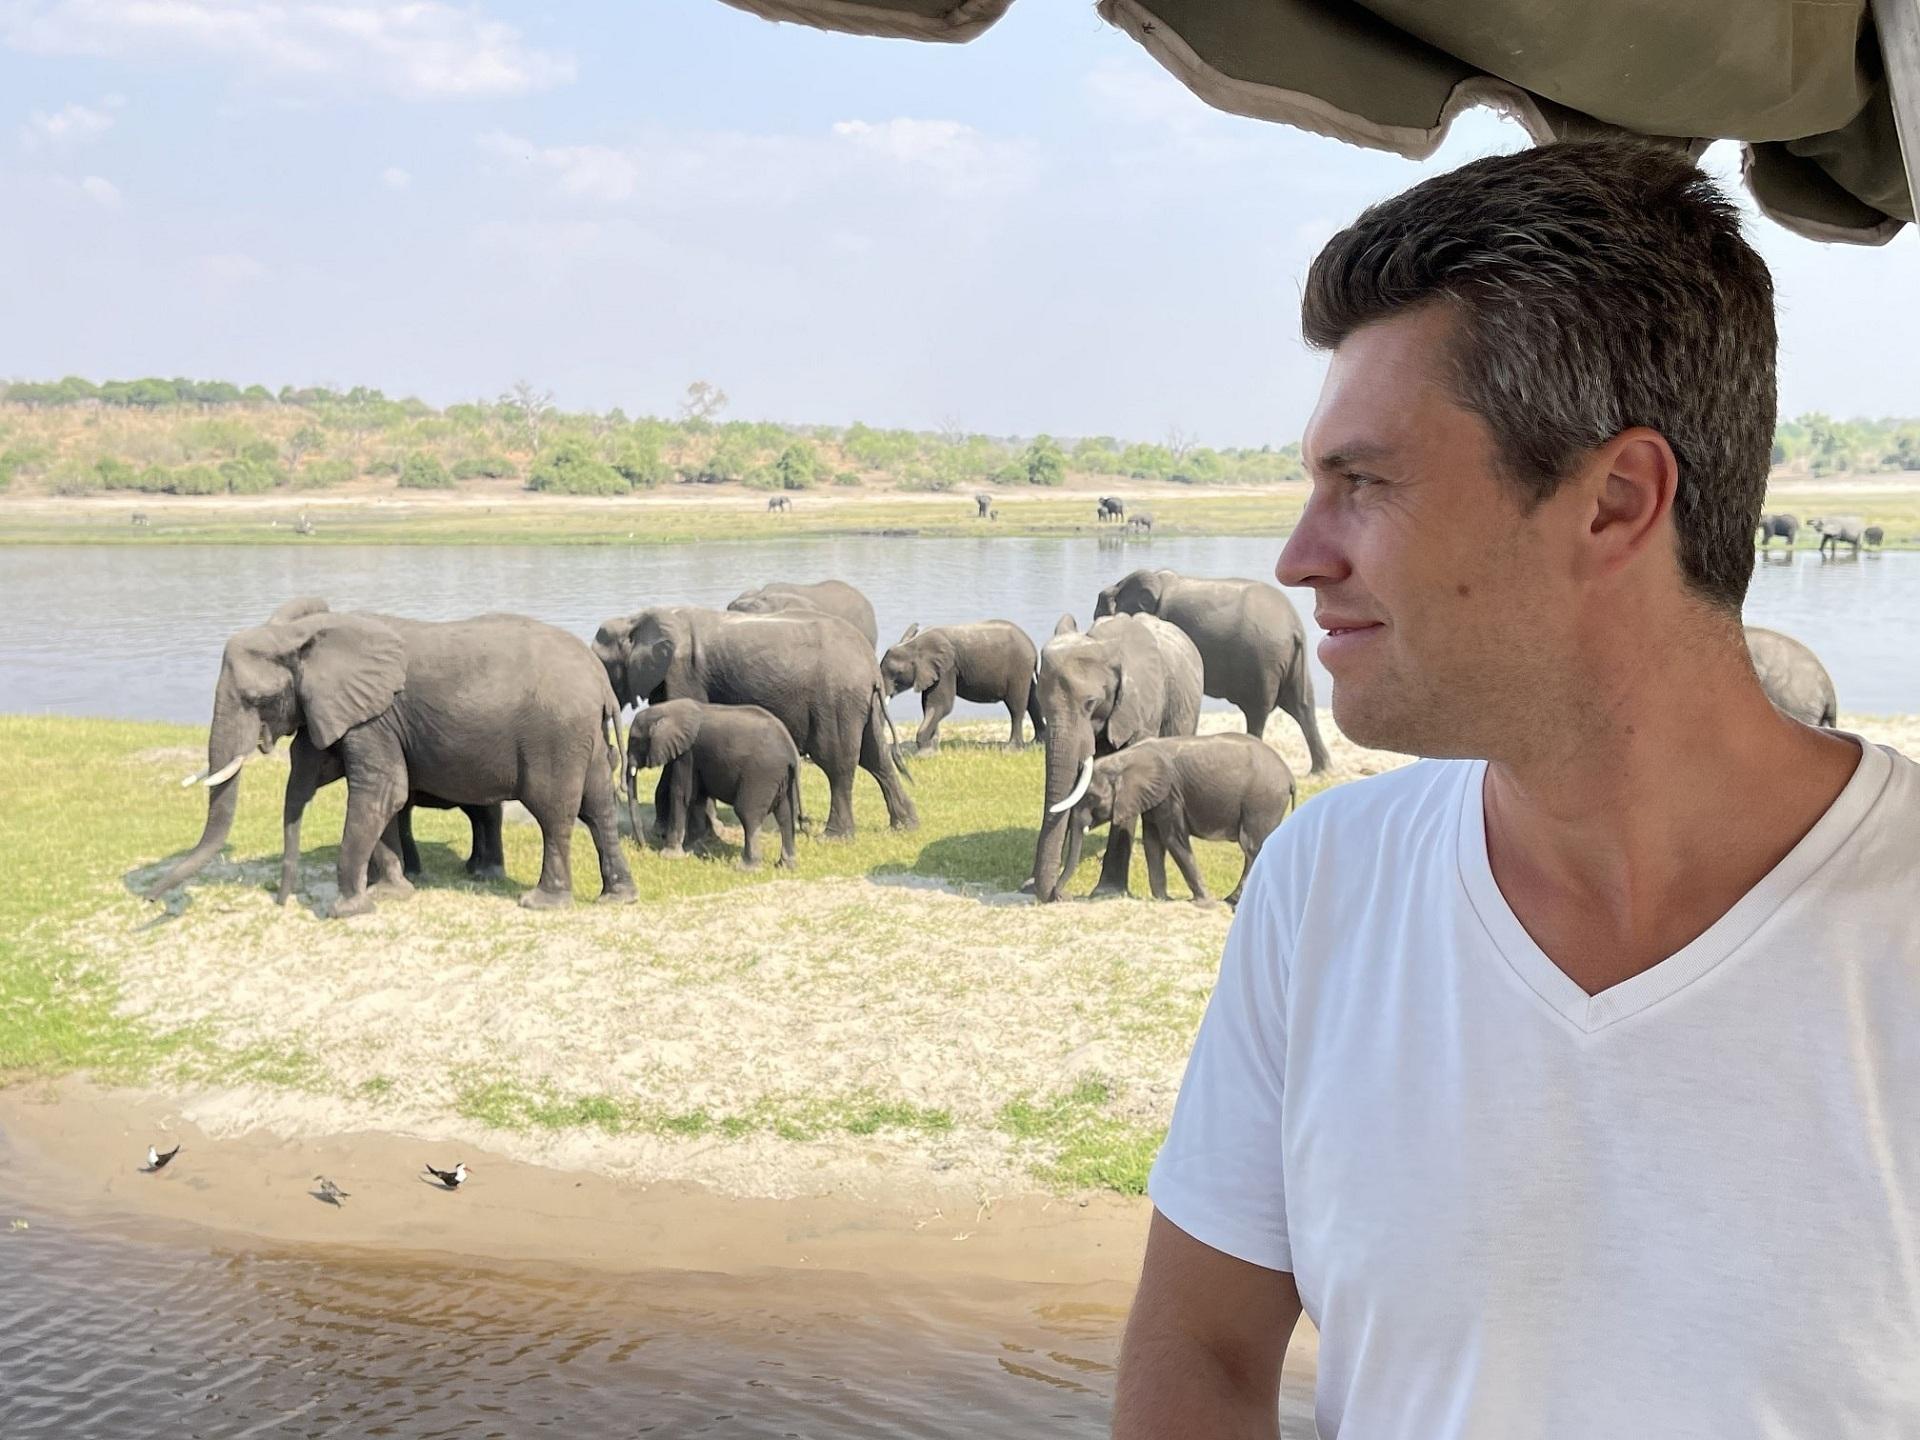 Композитор Евгений Хмара рассказал о приключениях в Замбии-Фото 1